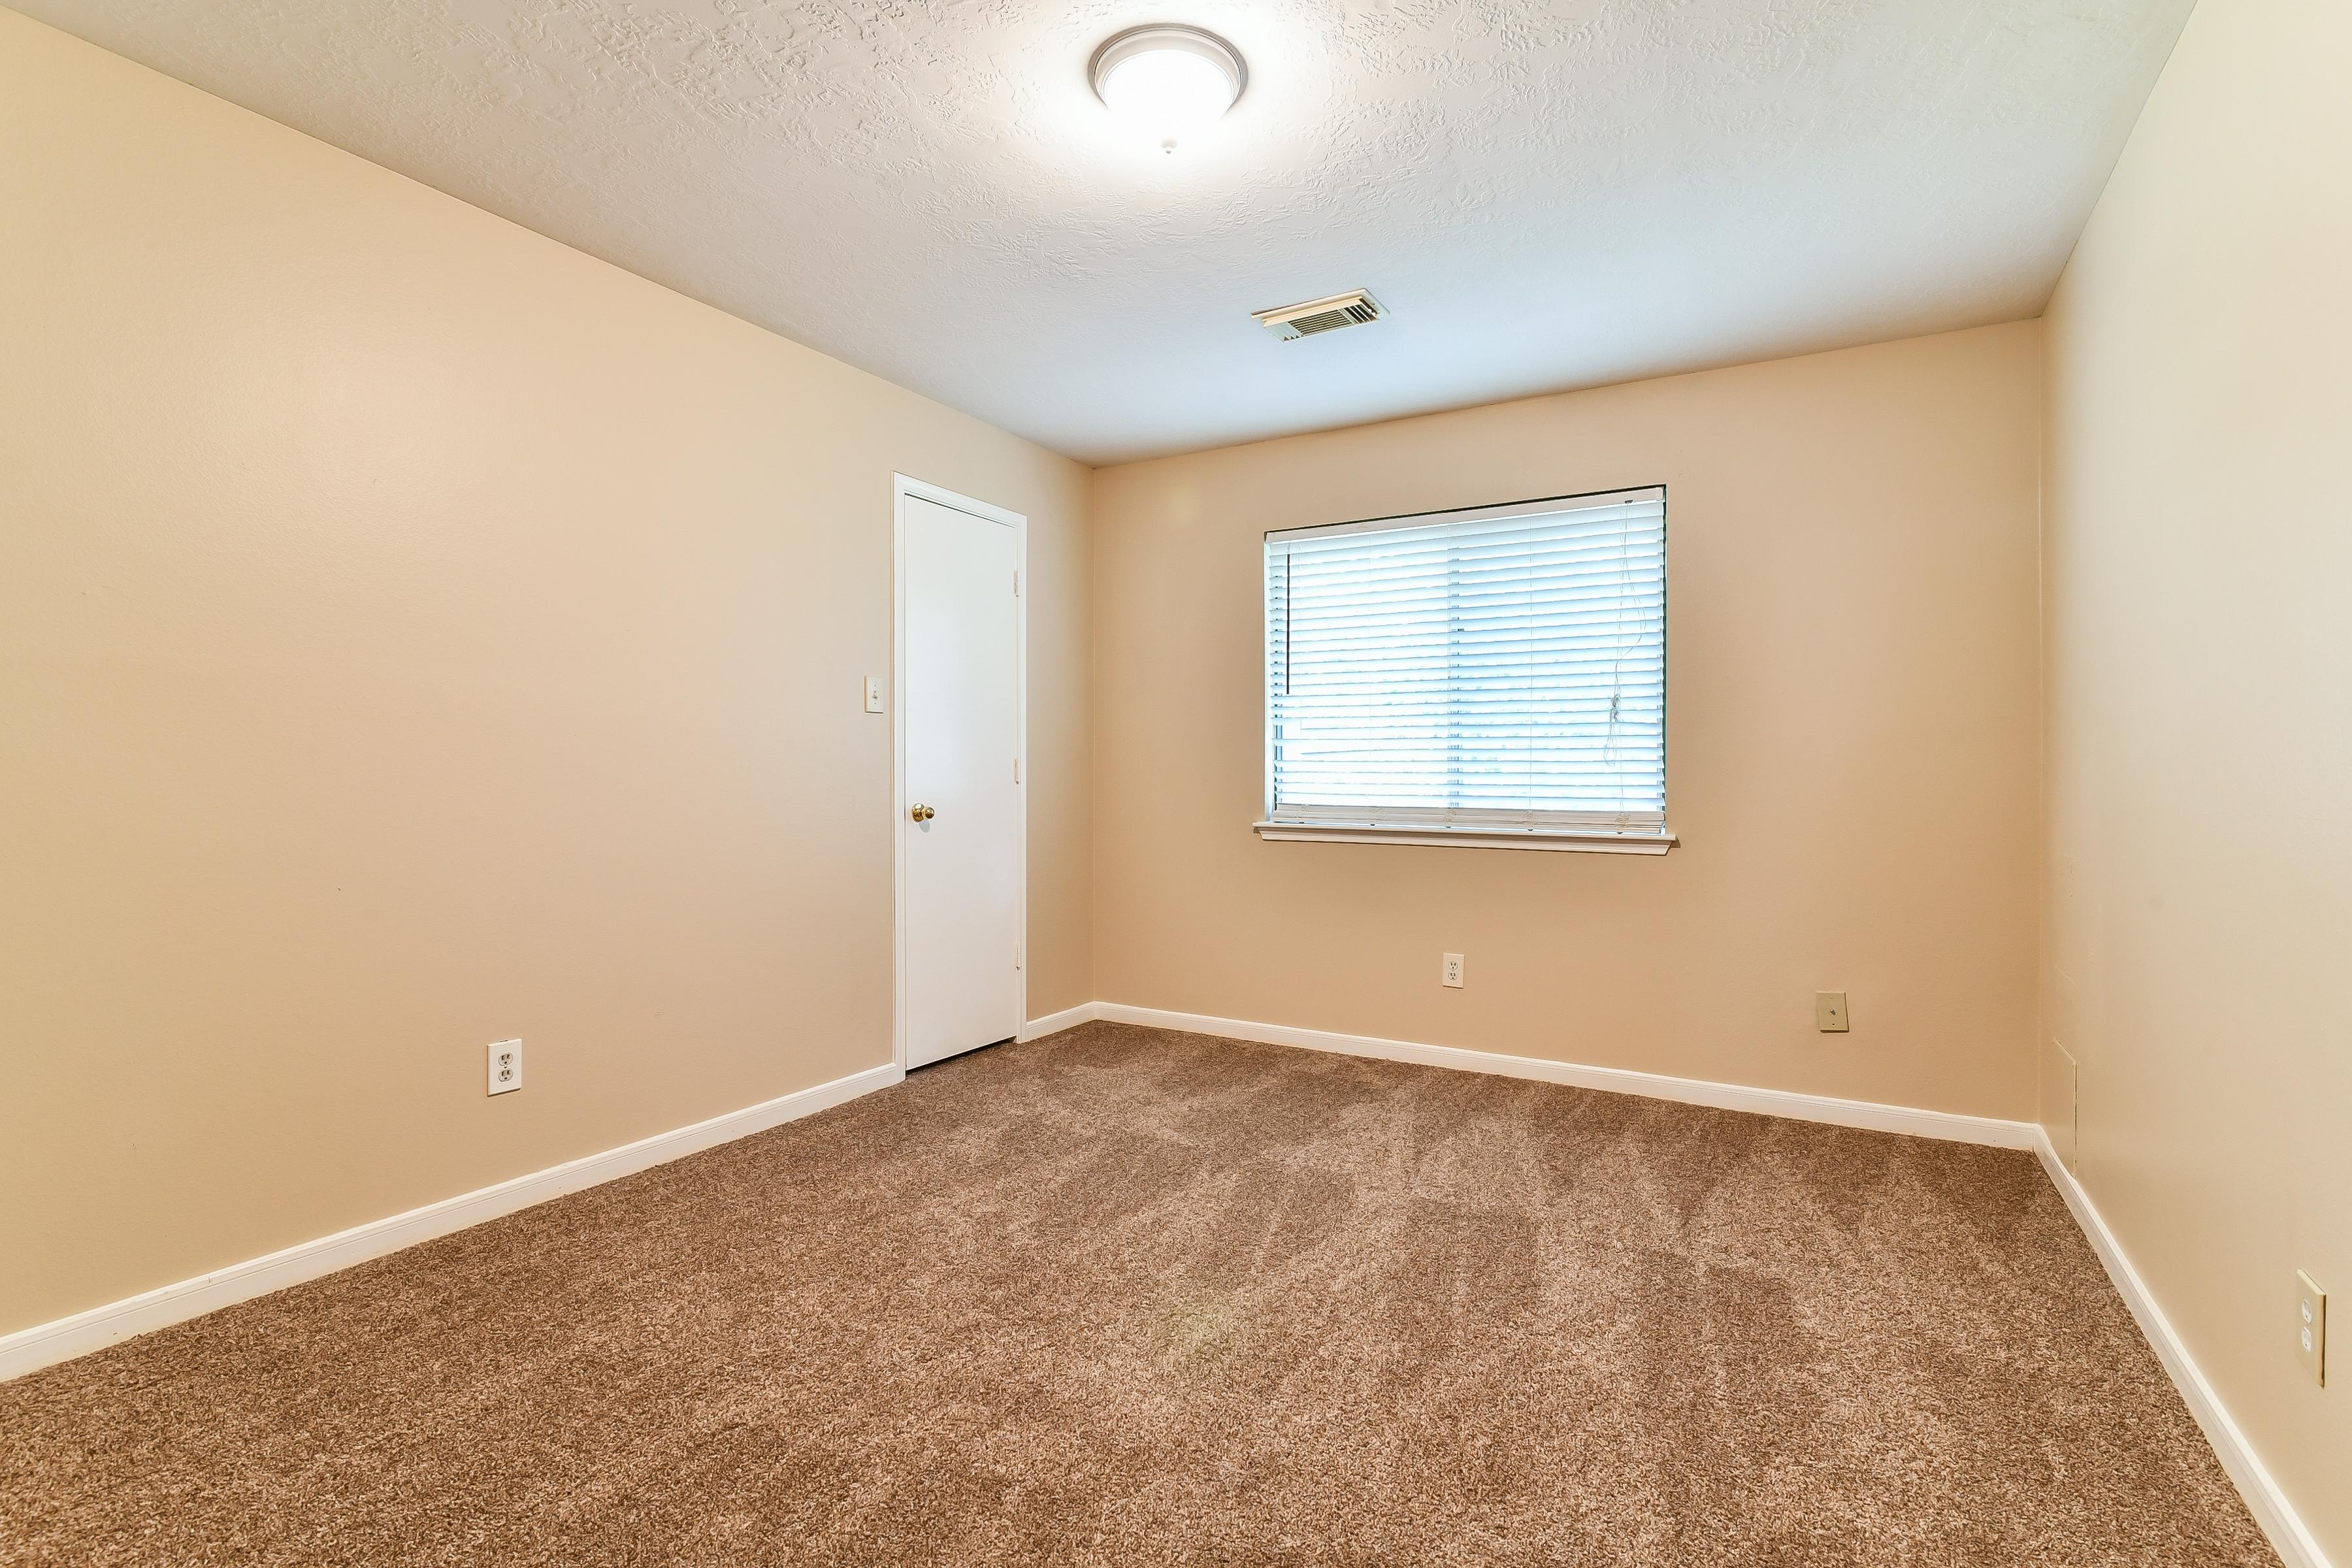 Photo of 14814 Cypress Green Drive, Cypress, TX, 77429